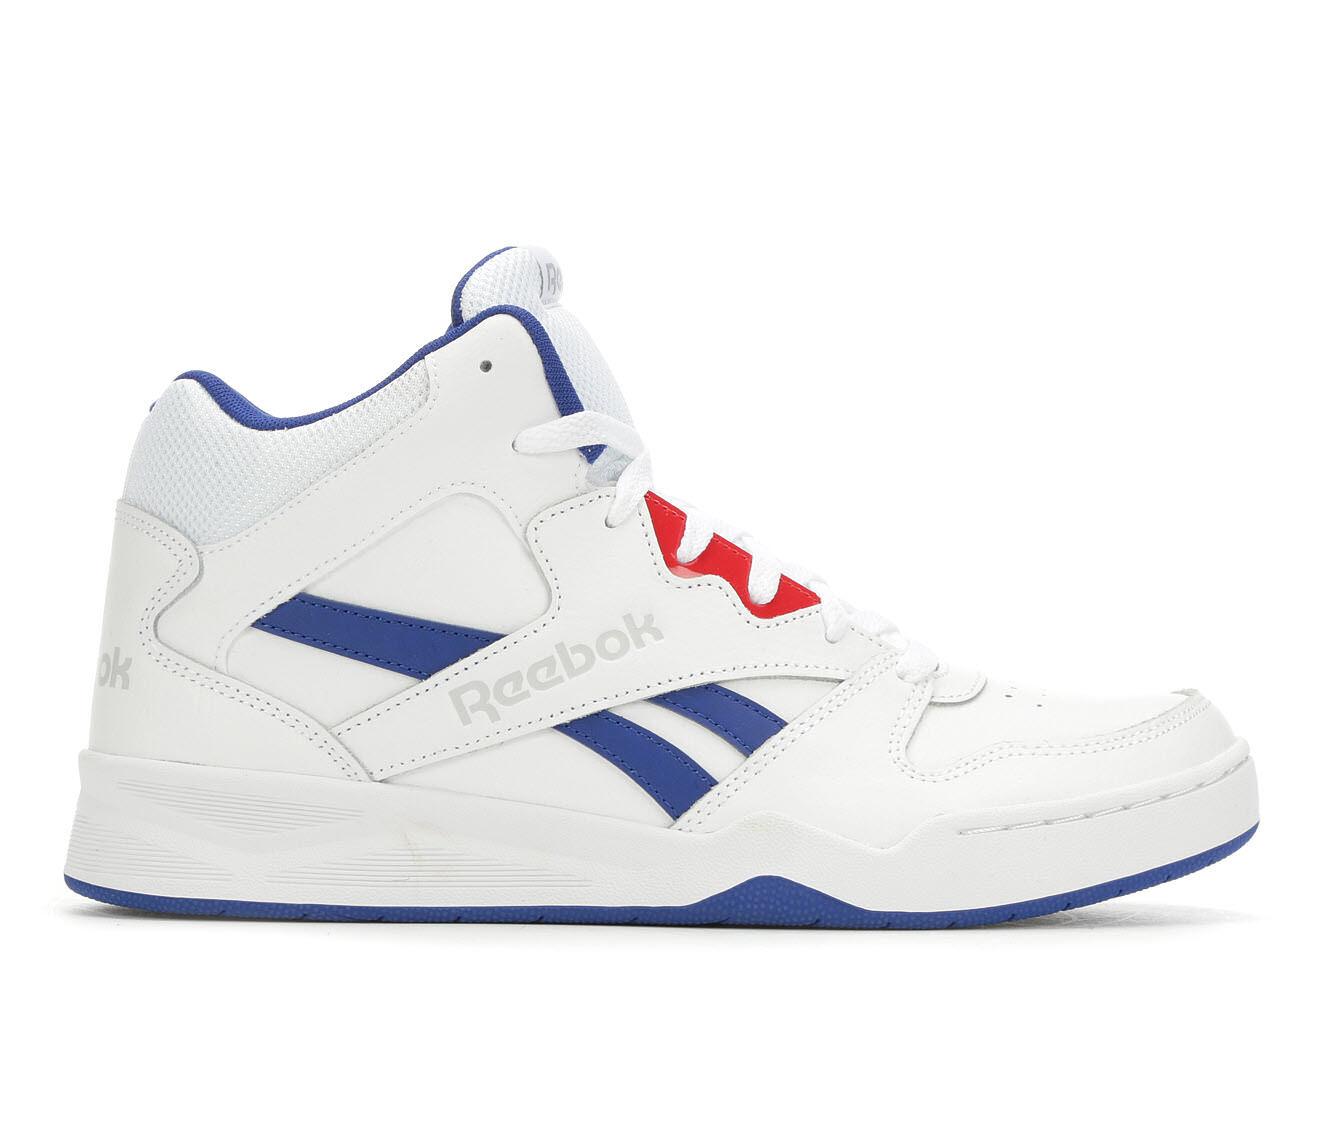 Superior Quality Men's Reebok Royal BB4500 HI2 Retro Sneakers Wht/Blu